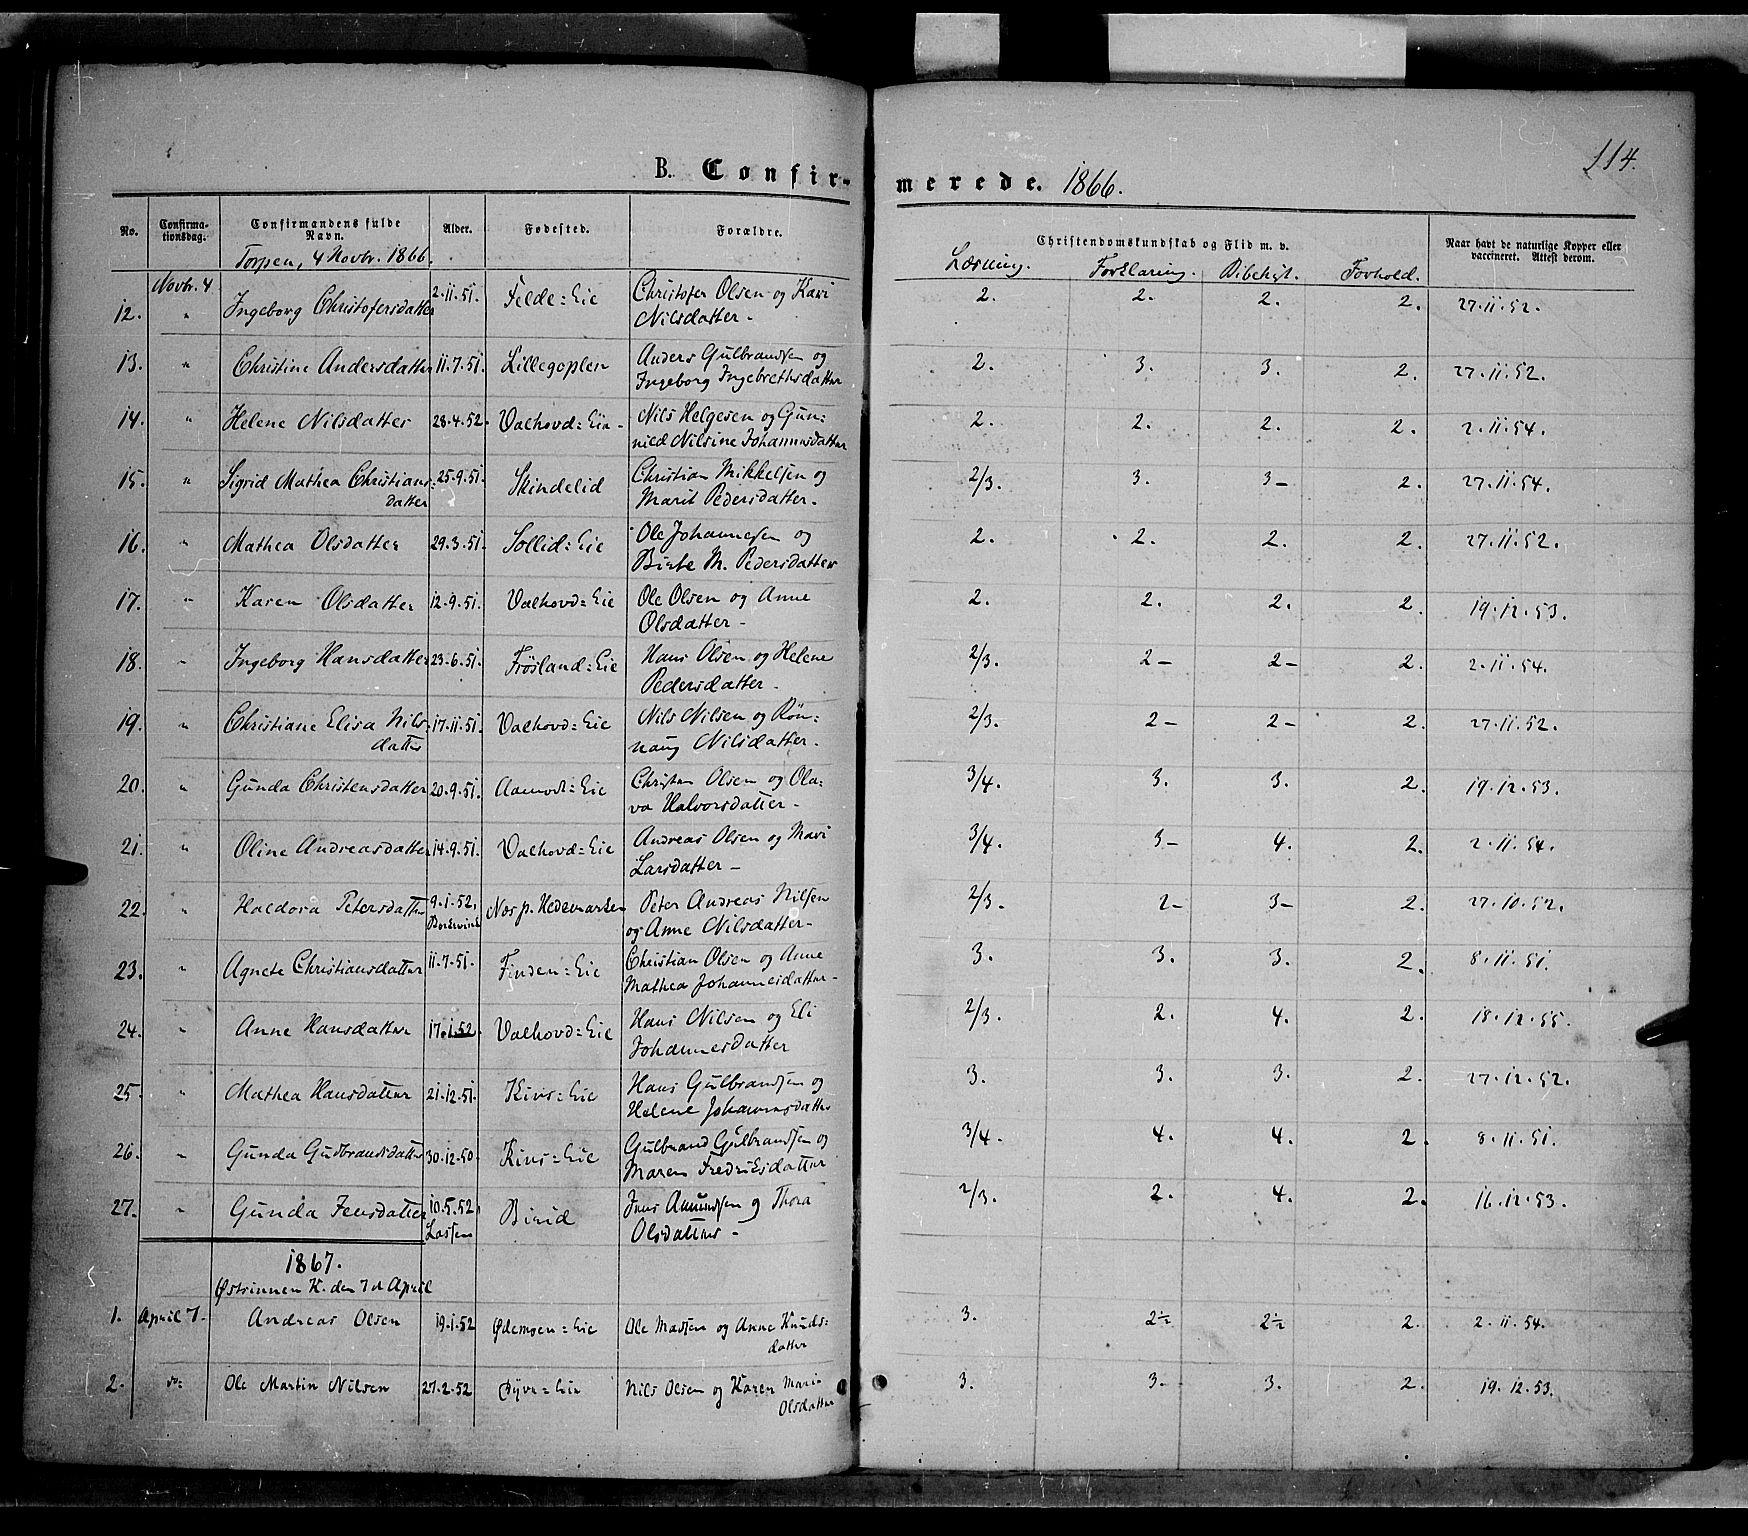 SAH, Nordre Land prestekontor, Ministerialbok nr. 1, 1860-1871, s. 114